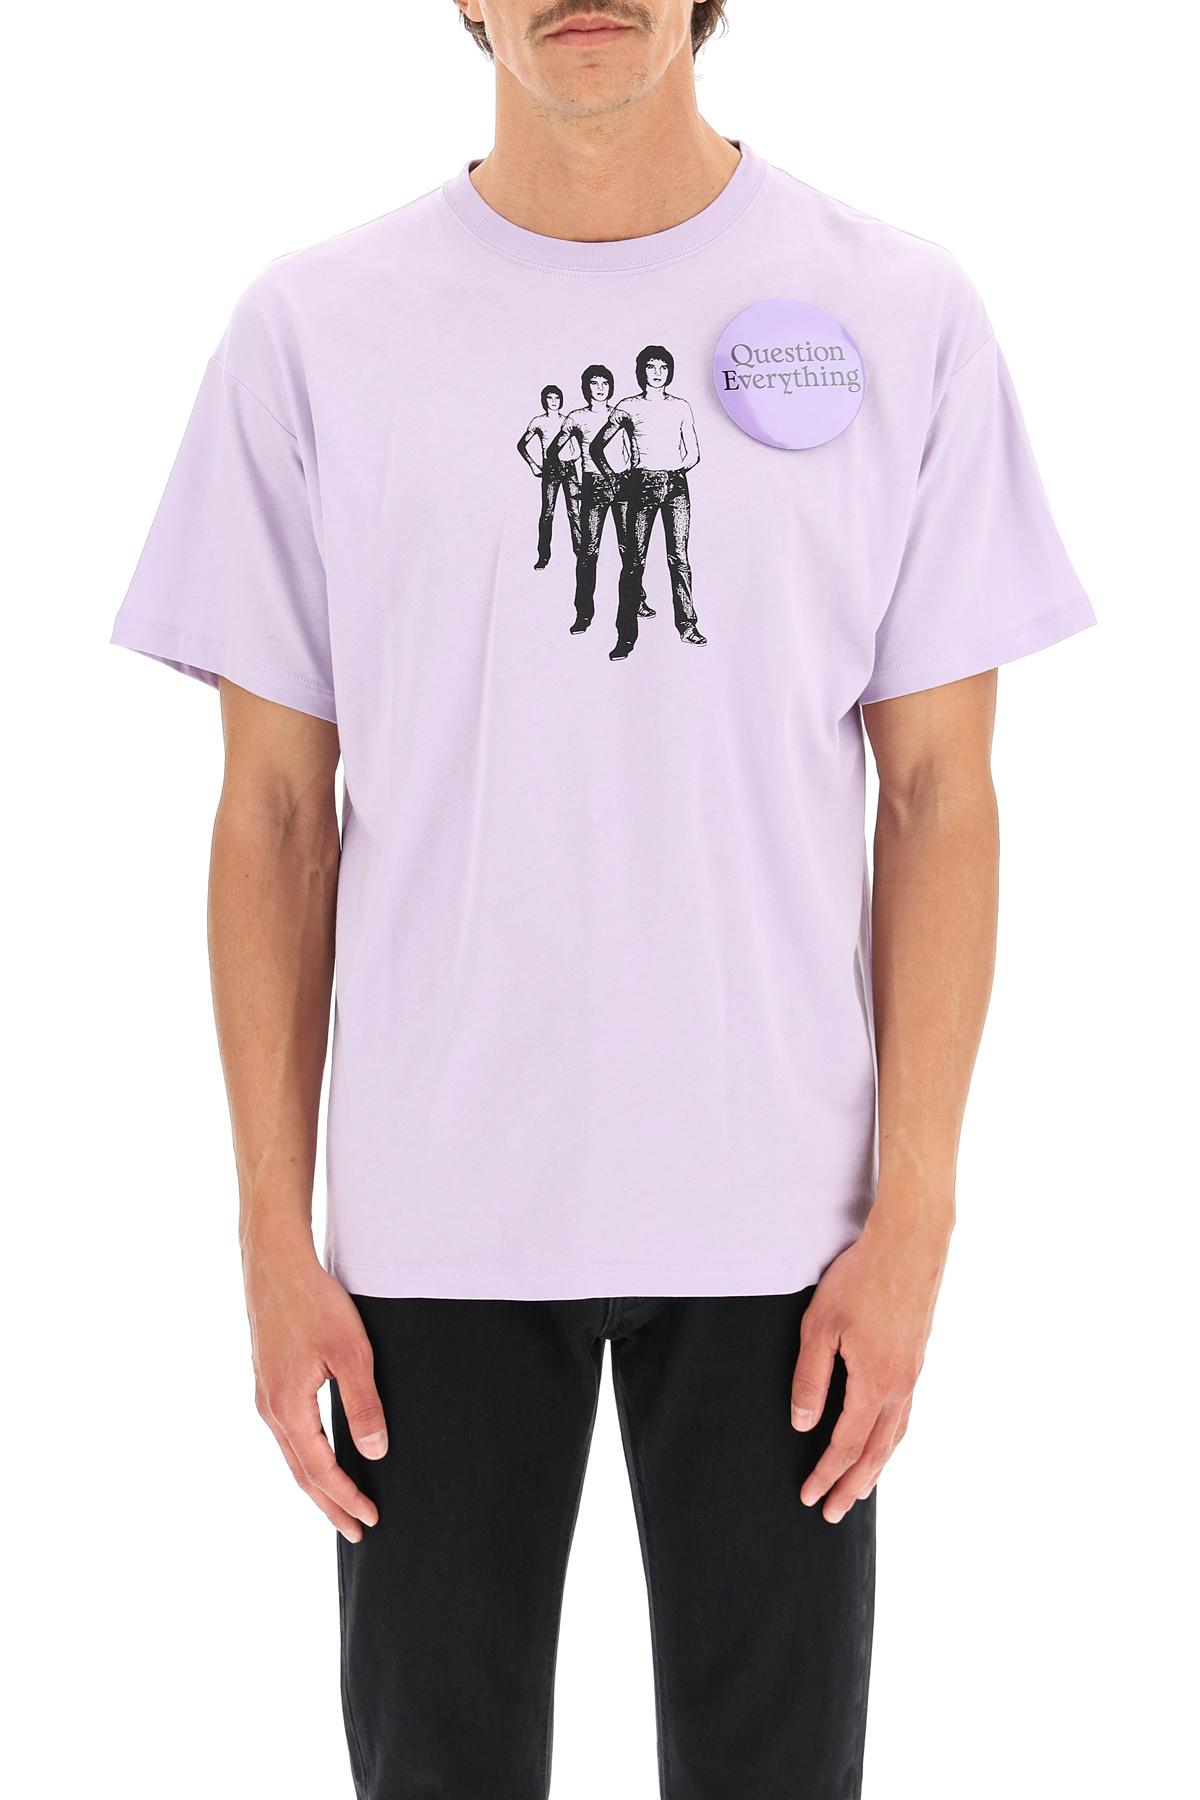 Raf simons t-shirt question everything